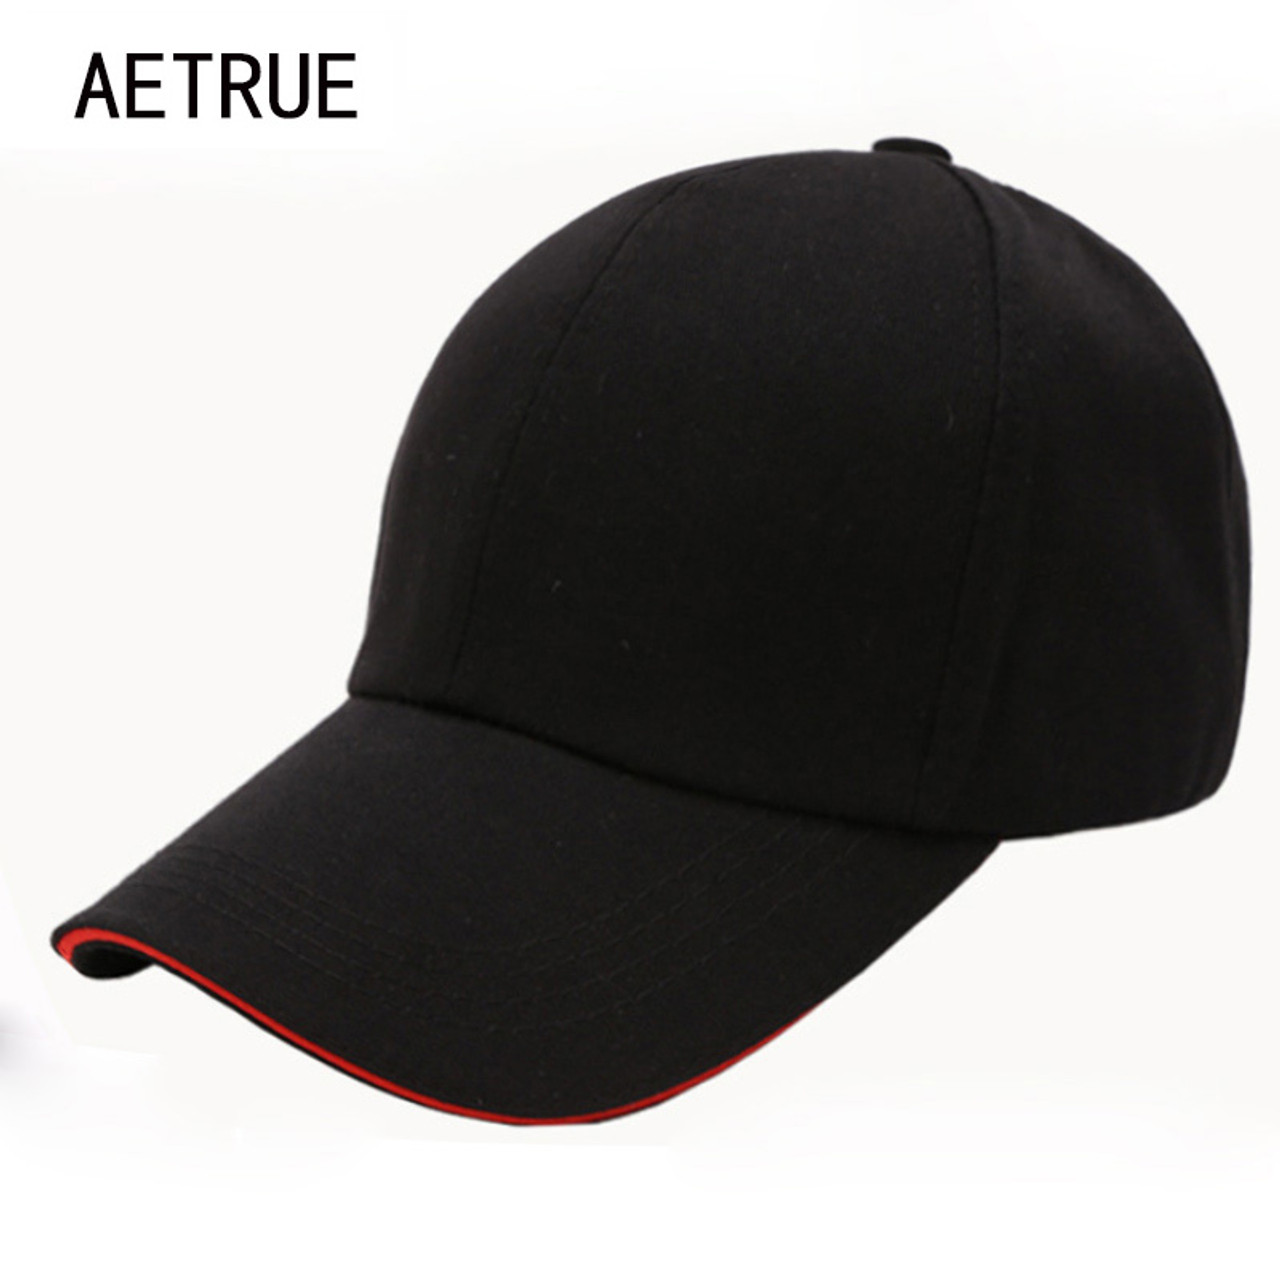 Men Baseball Cap Women Snapback Caps Casquette Hats For Men Plain Blank  Bone Solid Gorras Planas ... eecfbb6c605f